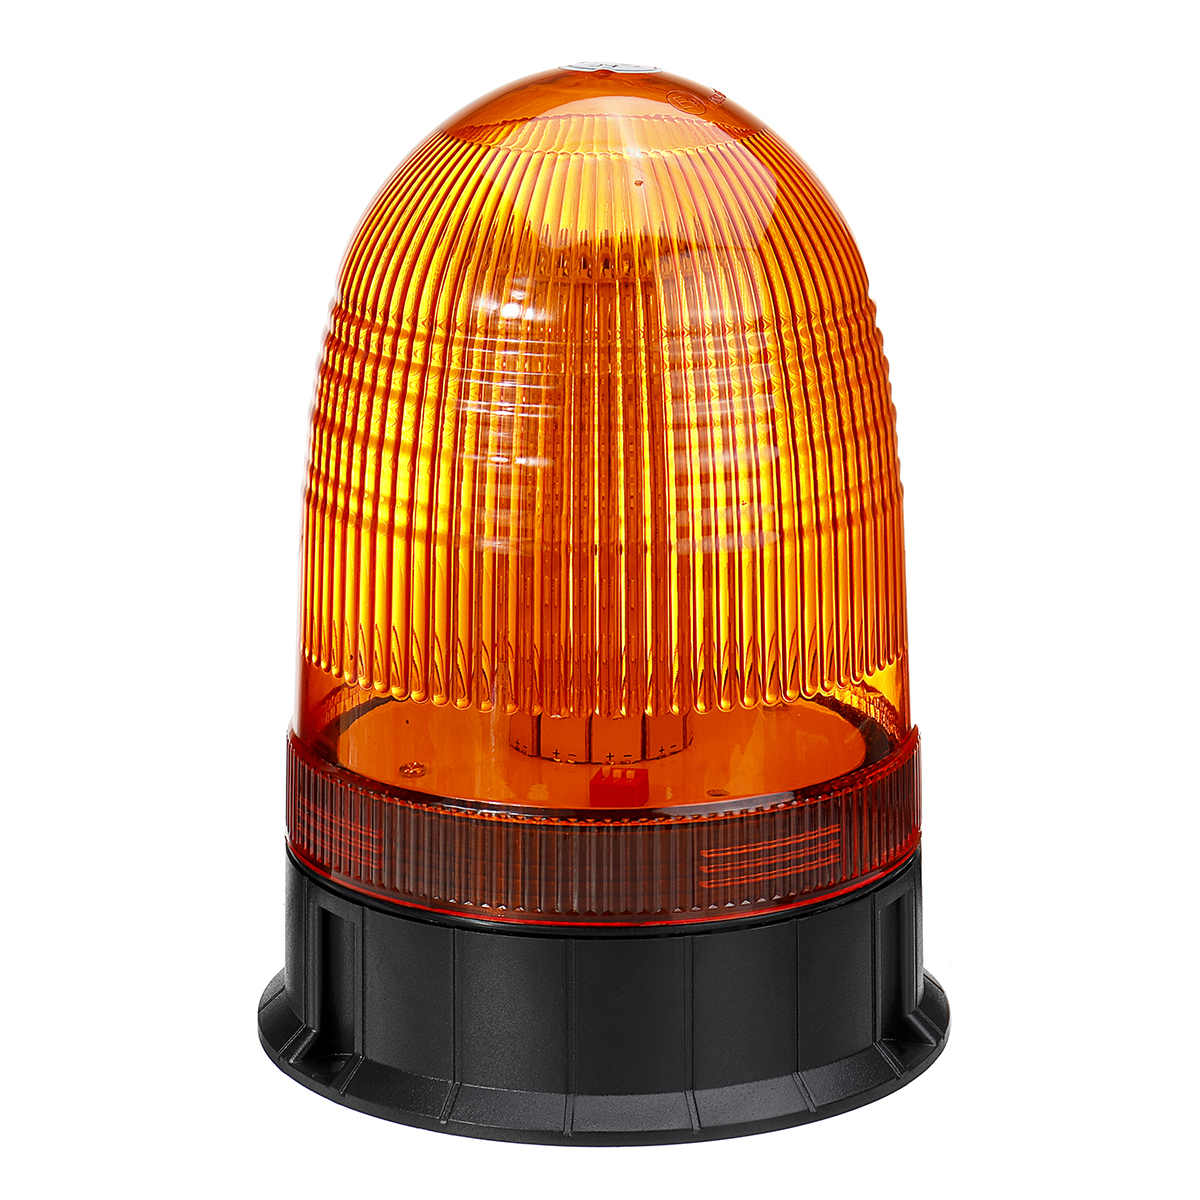 DC12-24V 80LED Magnetic Roof Rotating Flash Amber Beacon Strobe Tractor Warning Signal Light